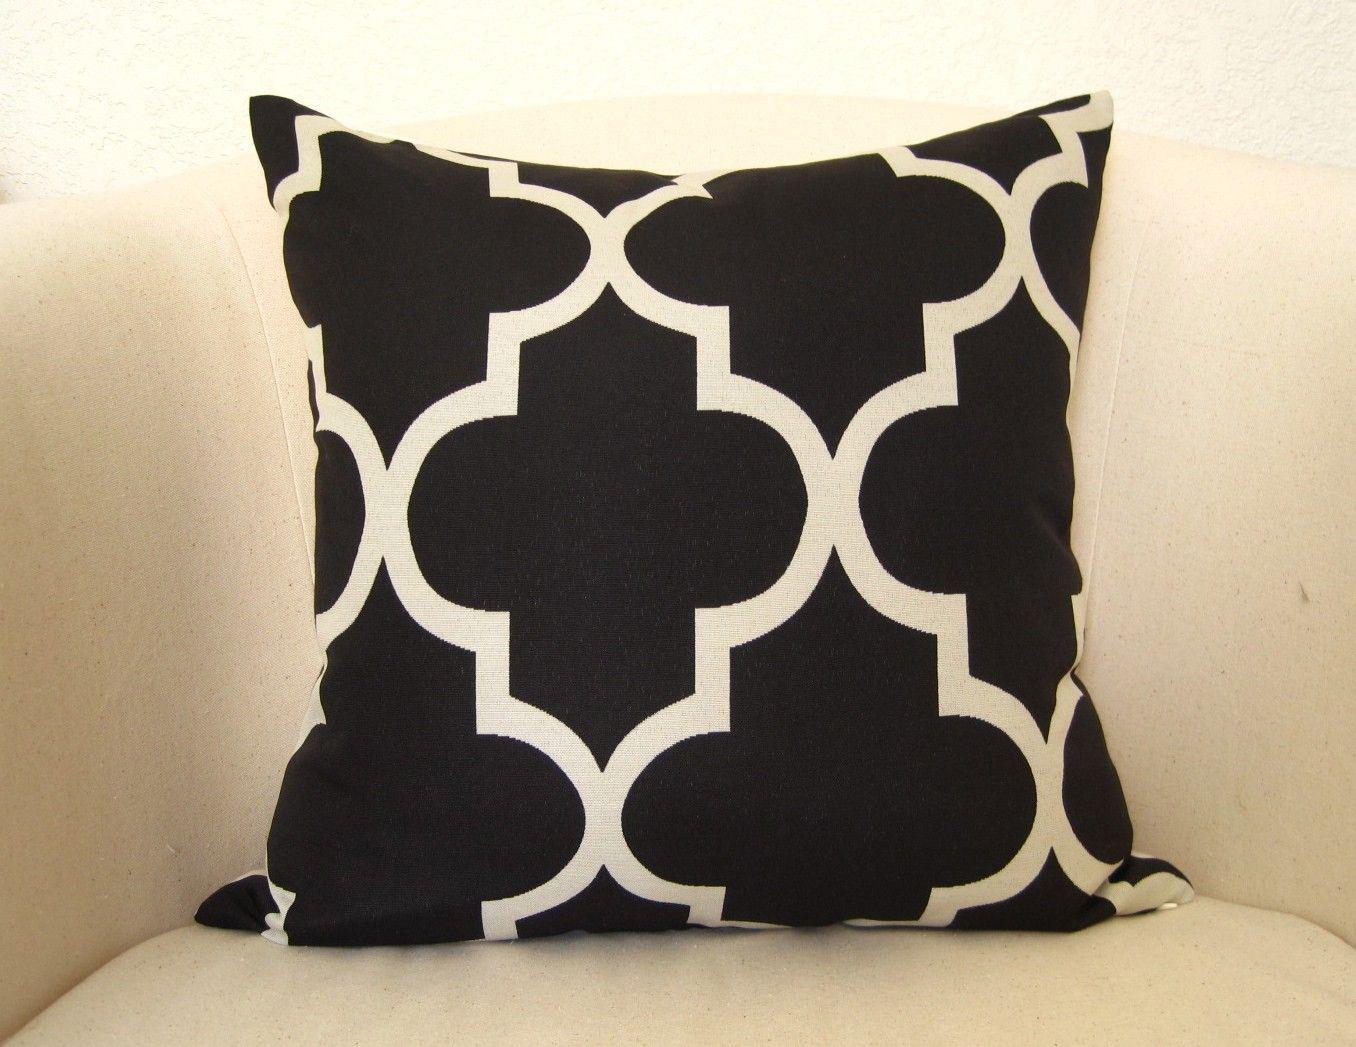 Moroccan Quatrefoil Lattice Pillow Cover - 18 inch - Black - Trellis Pillow - Designer Pillow - Throw